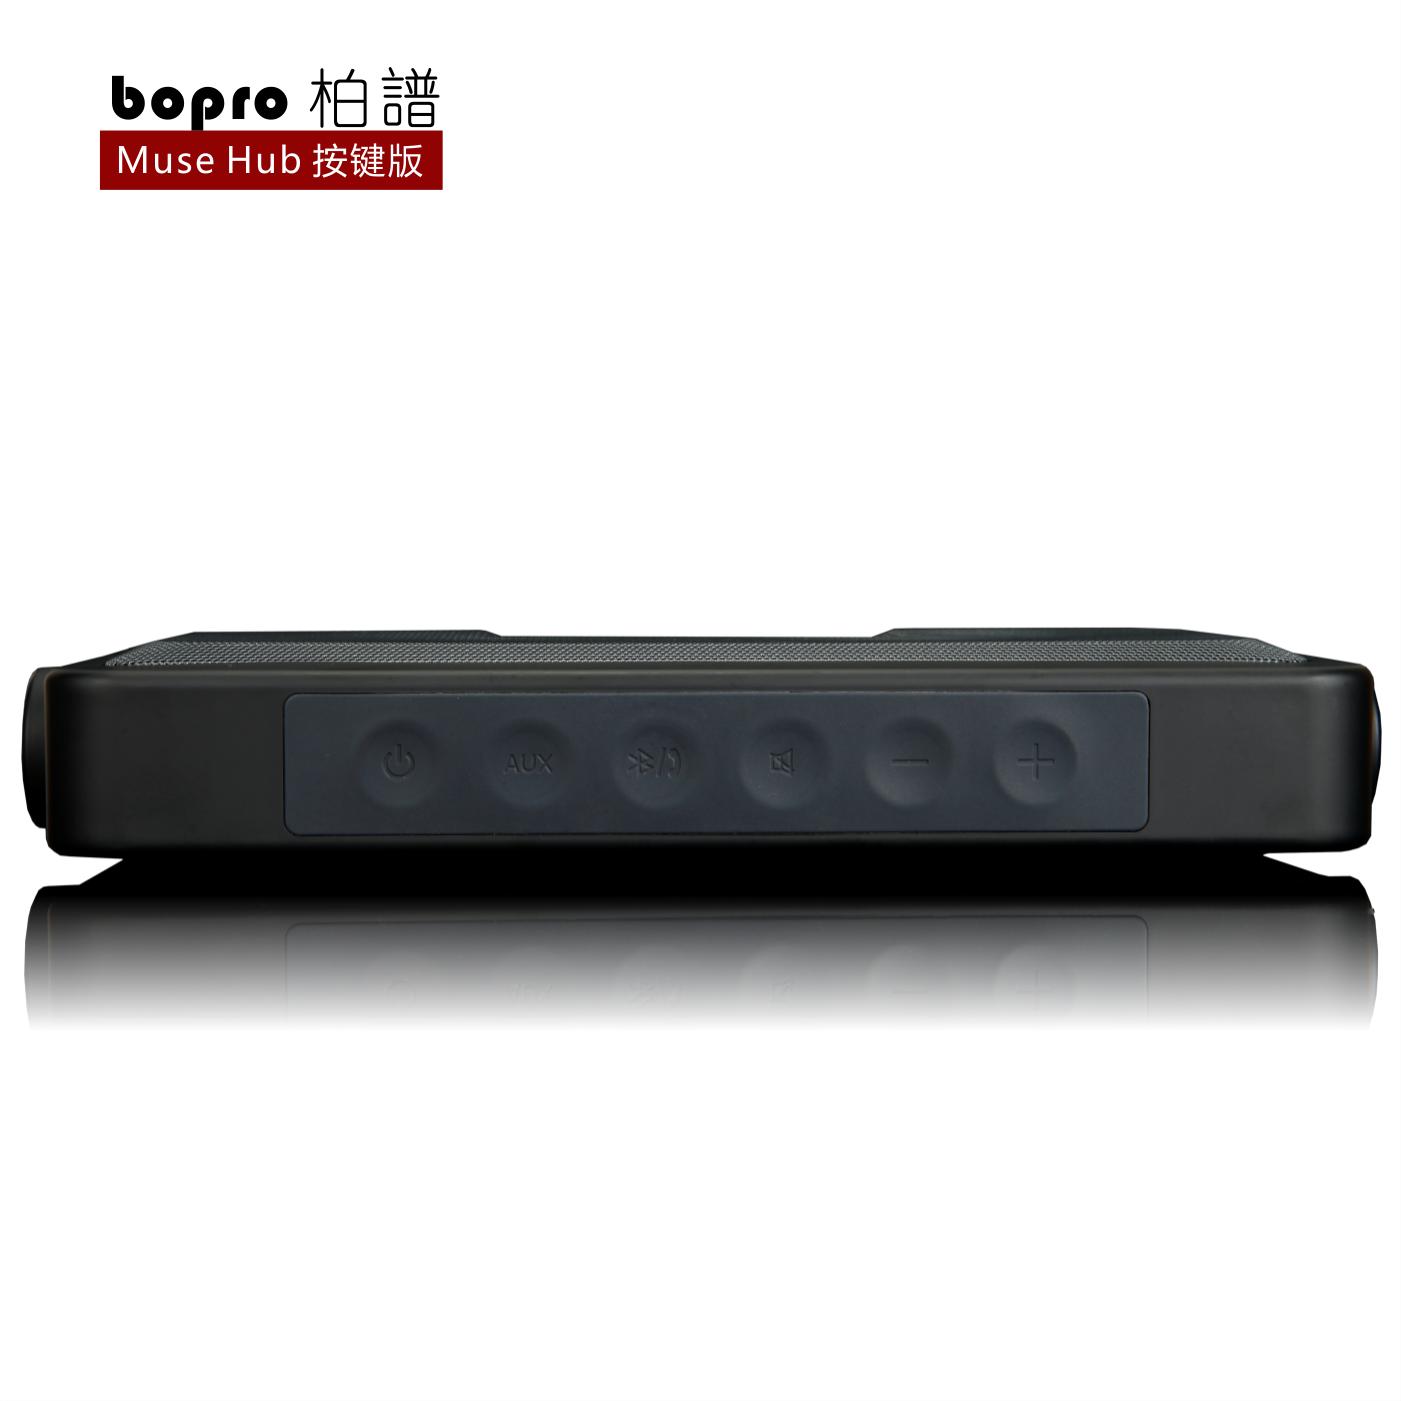 bopro-柏谱 Muse Hub按键版魔族music户外HIFI小音响无线蓝牙音箱